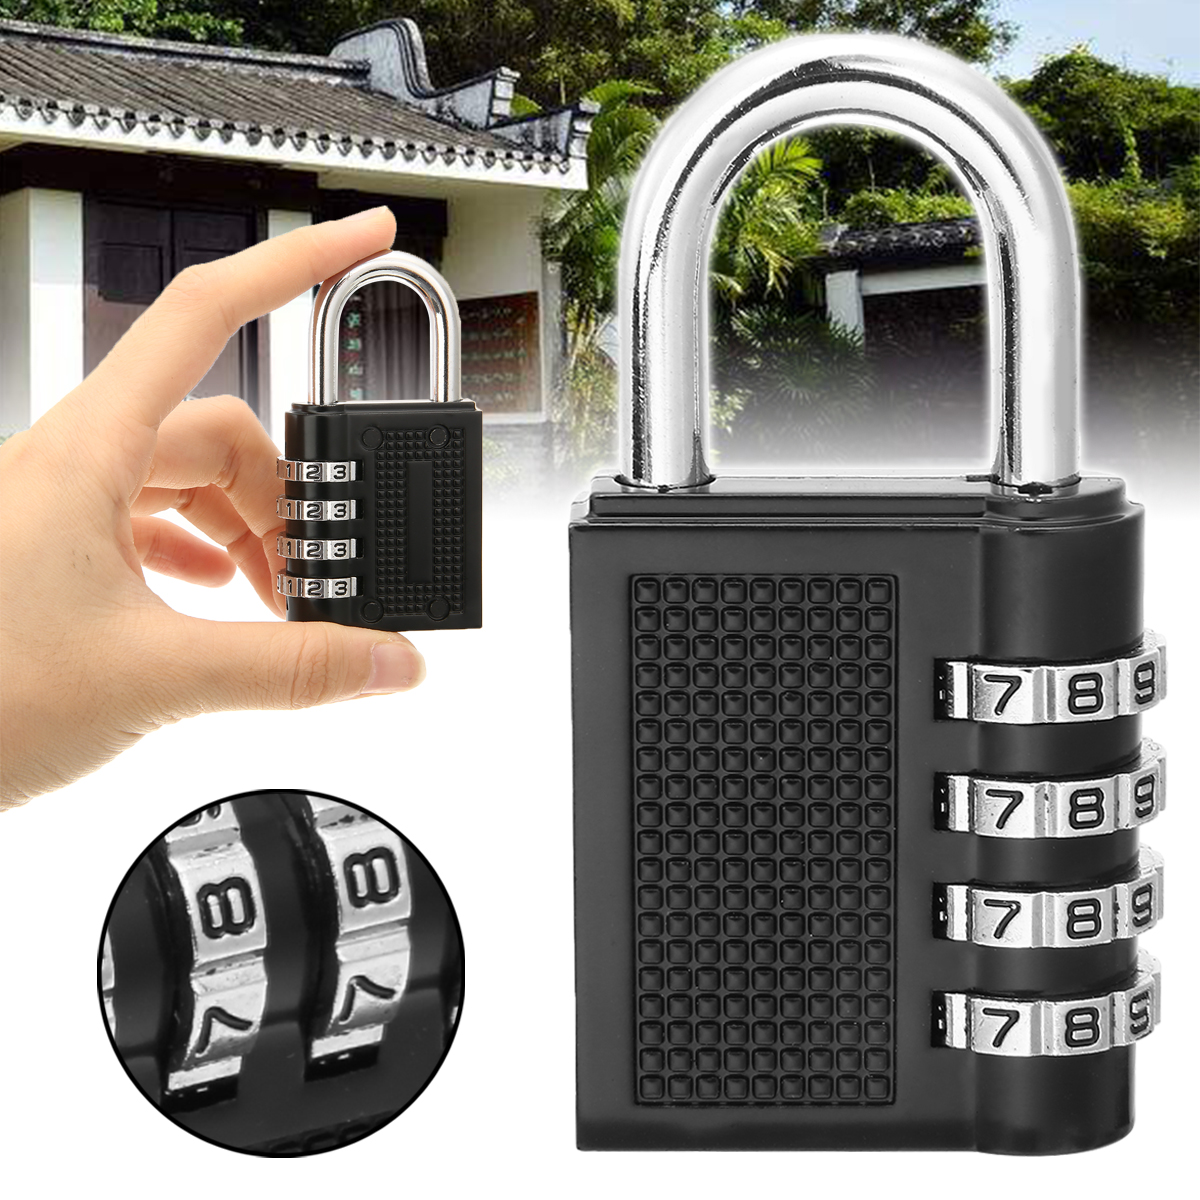 80*43*14mm Heavy Duty 4 Dial Digit Combination Lock Weatherproof Security Padlock Outdoor Gym Safely